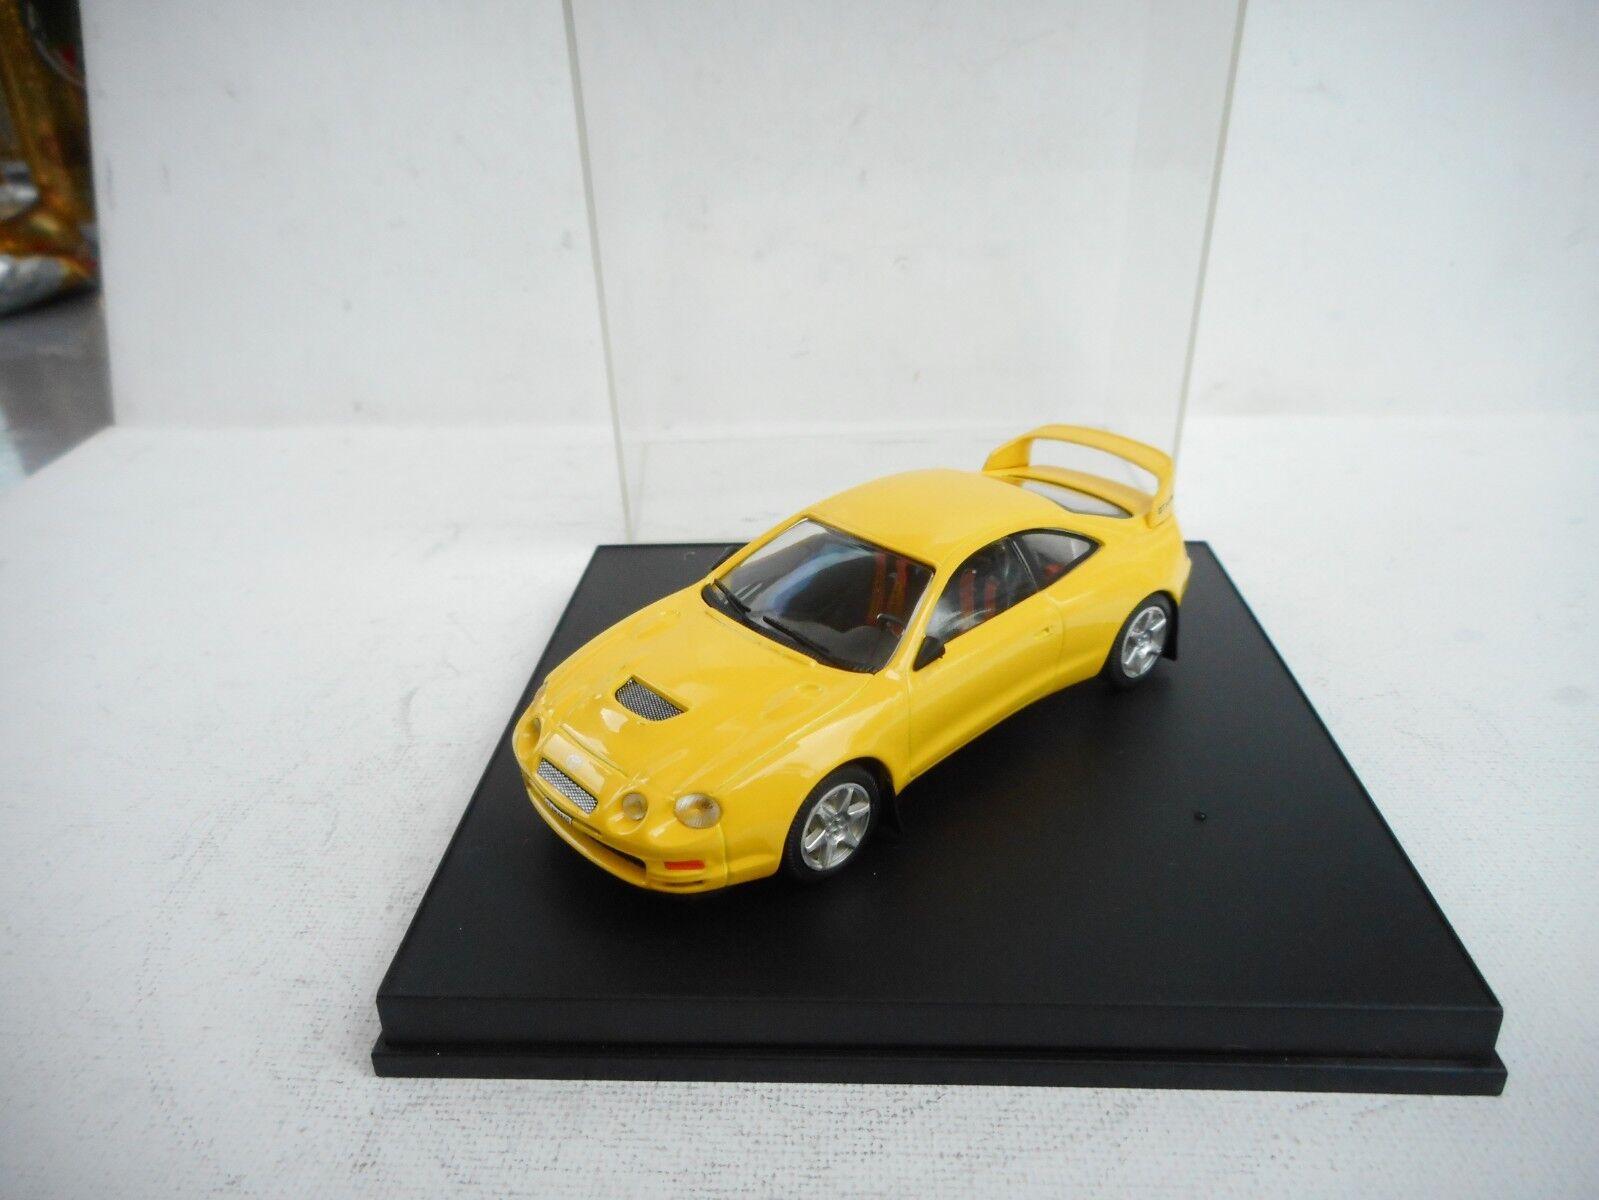 Toyota celica gt gt gt - vier muleto gelb trofeu 701y 1 43 m kasten 8cd279